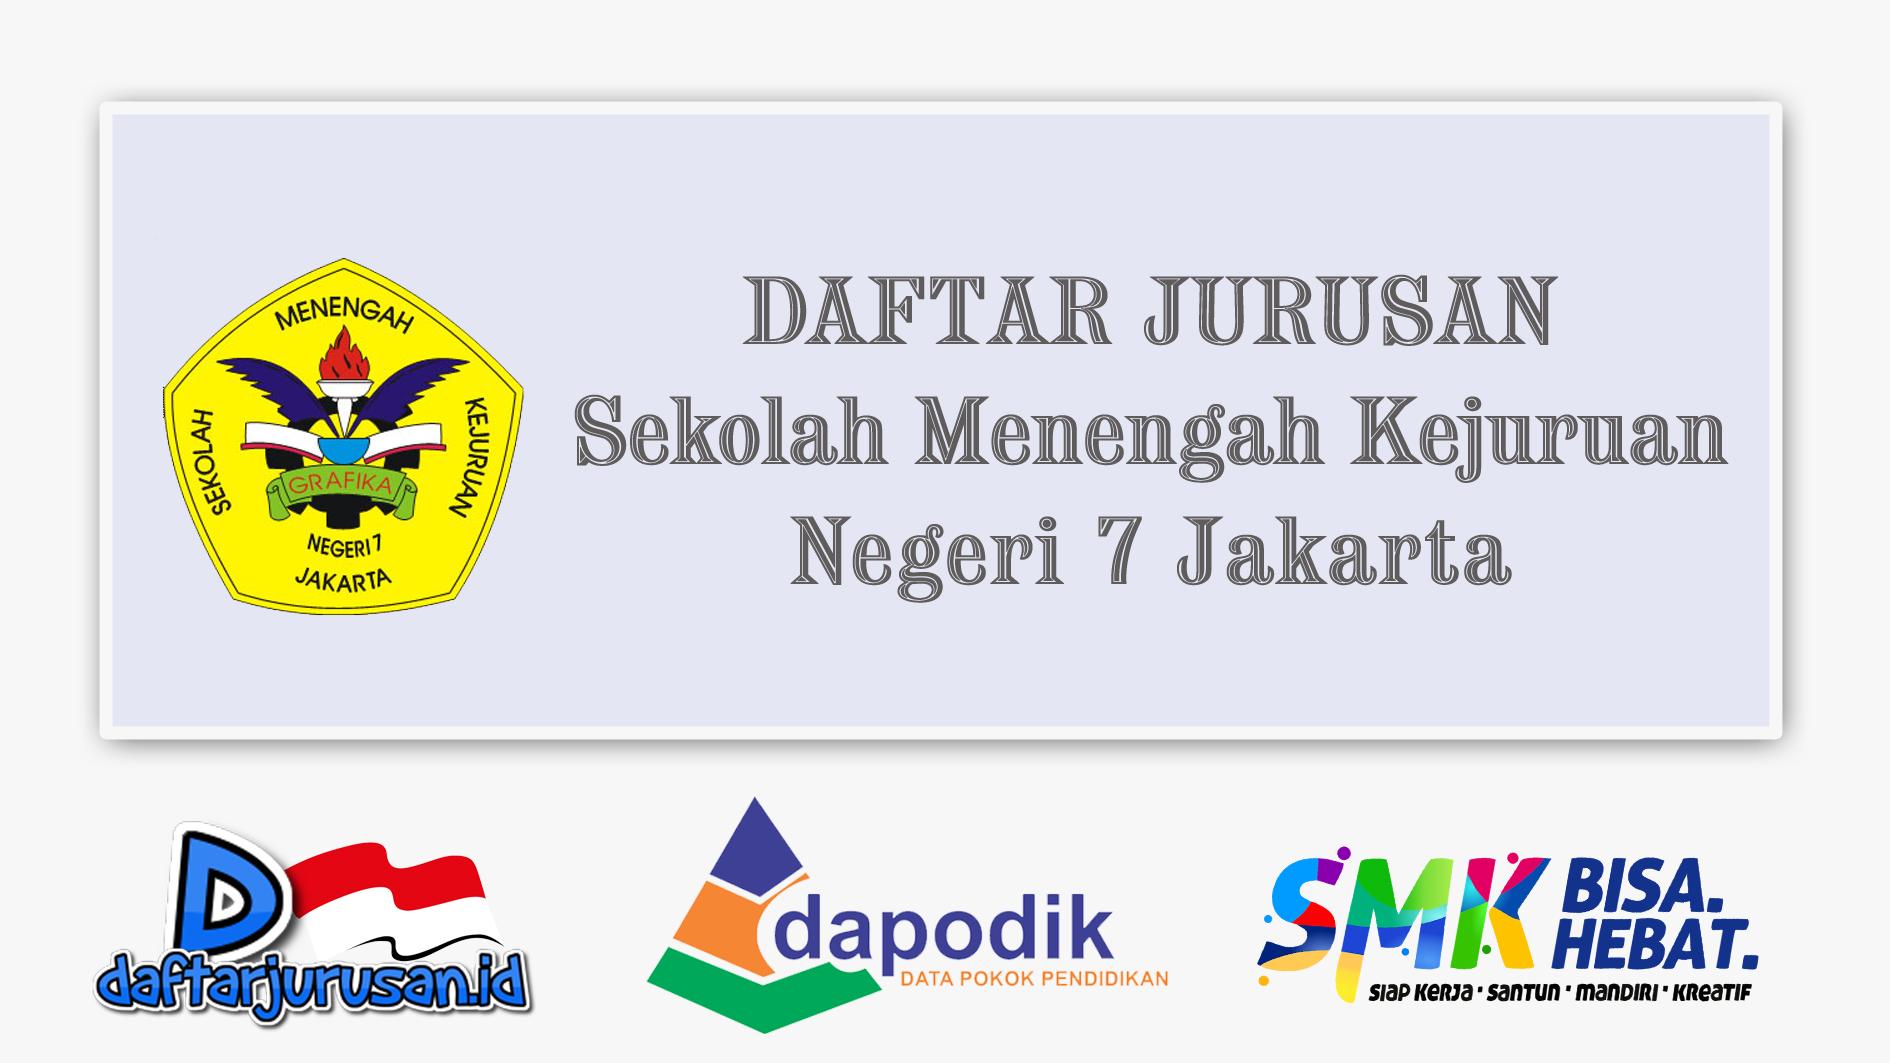 Daftar jurusan SMK Negeri 7 Jakarta Timur